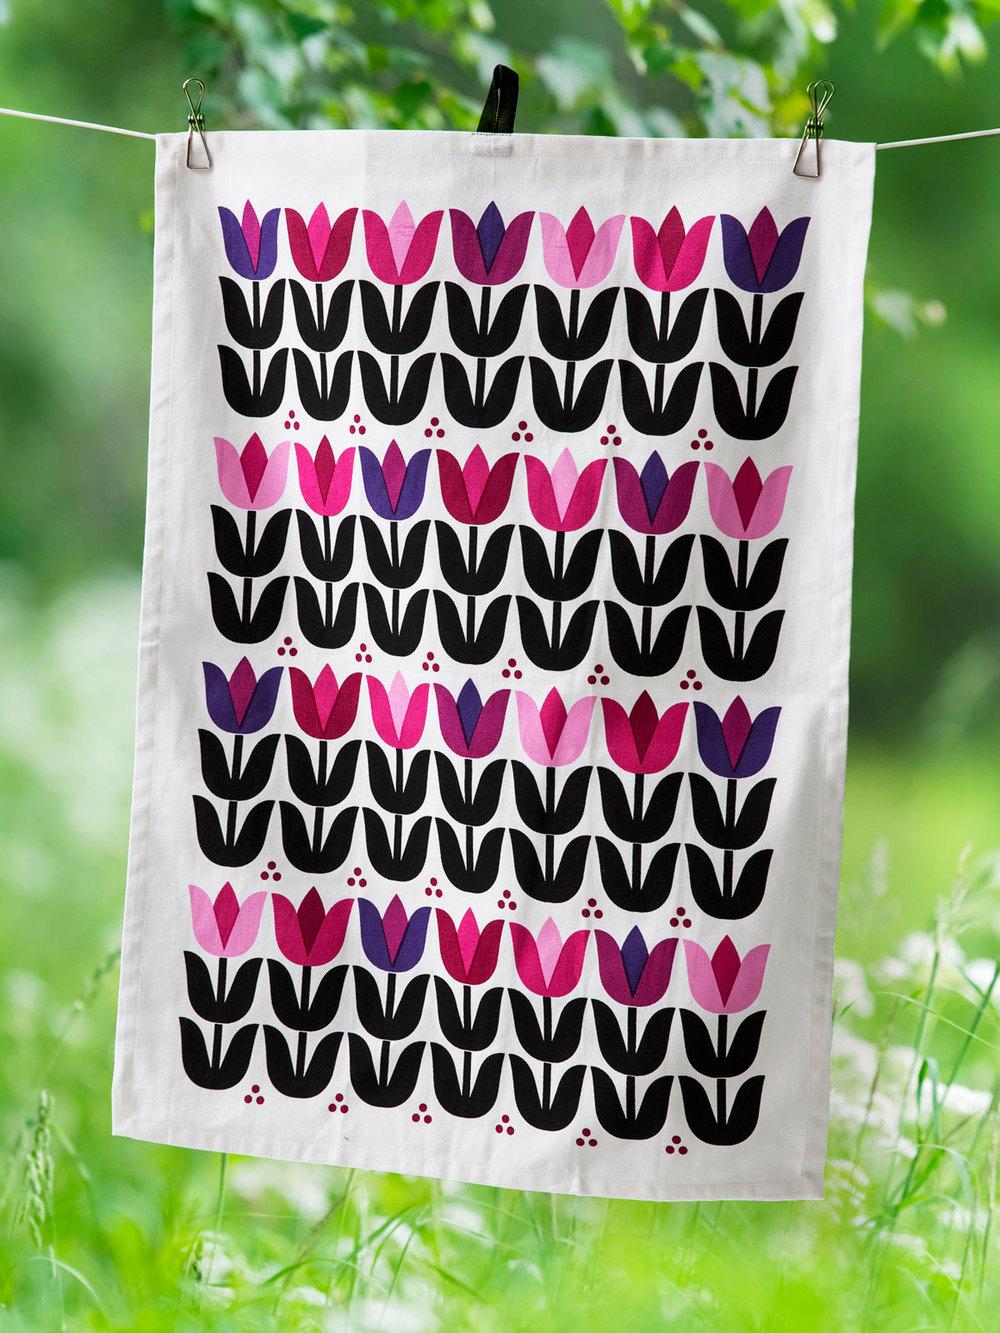 """Tulip""from Sagaform. Design by Lotta Odelius"